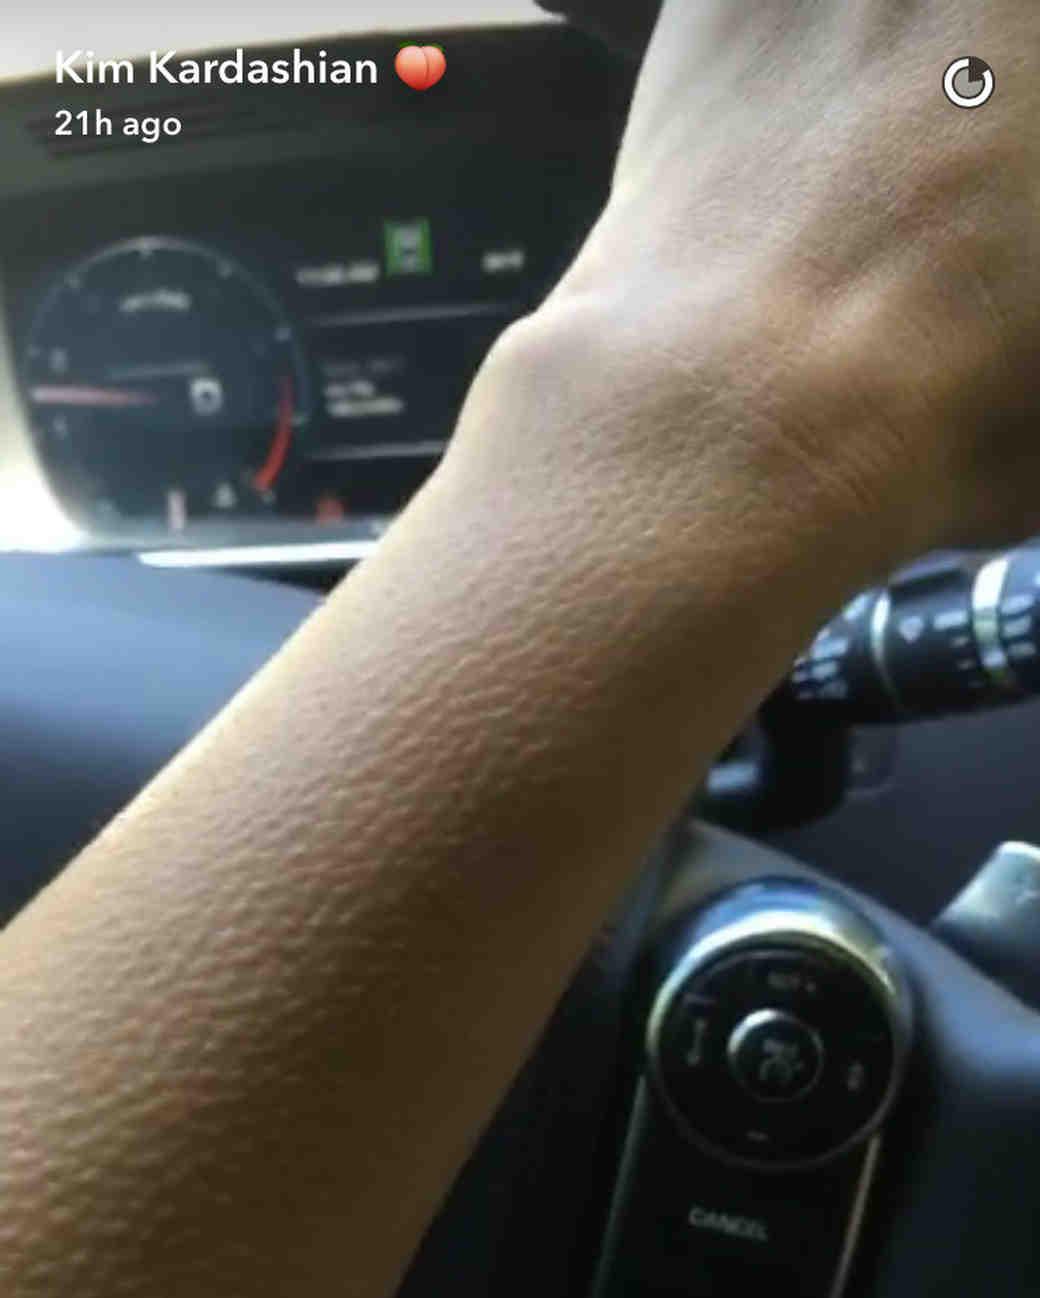 kim kardashian relationship with kanye goosebumps snapchat